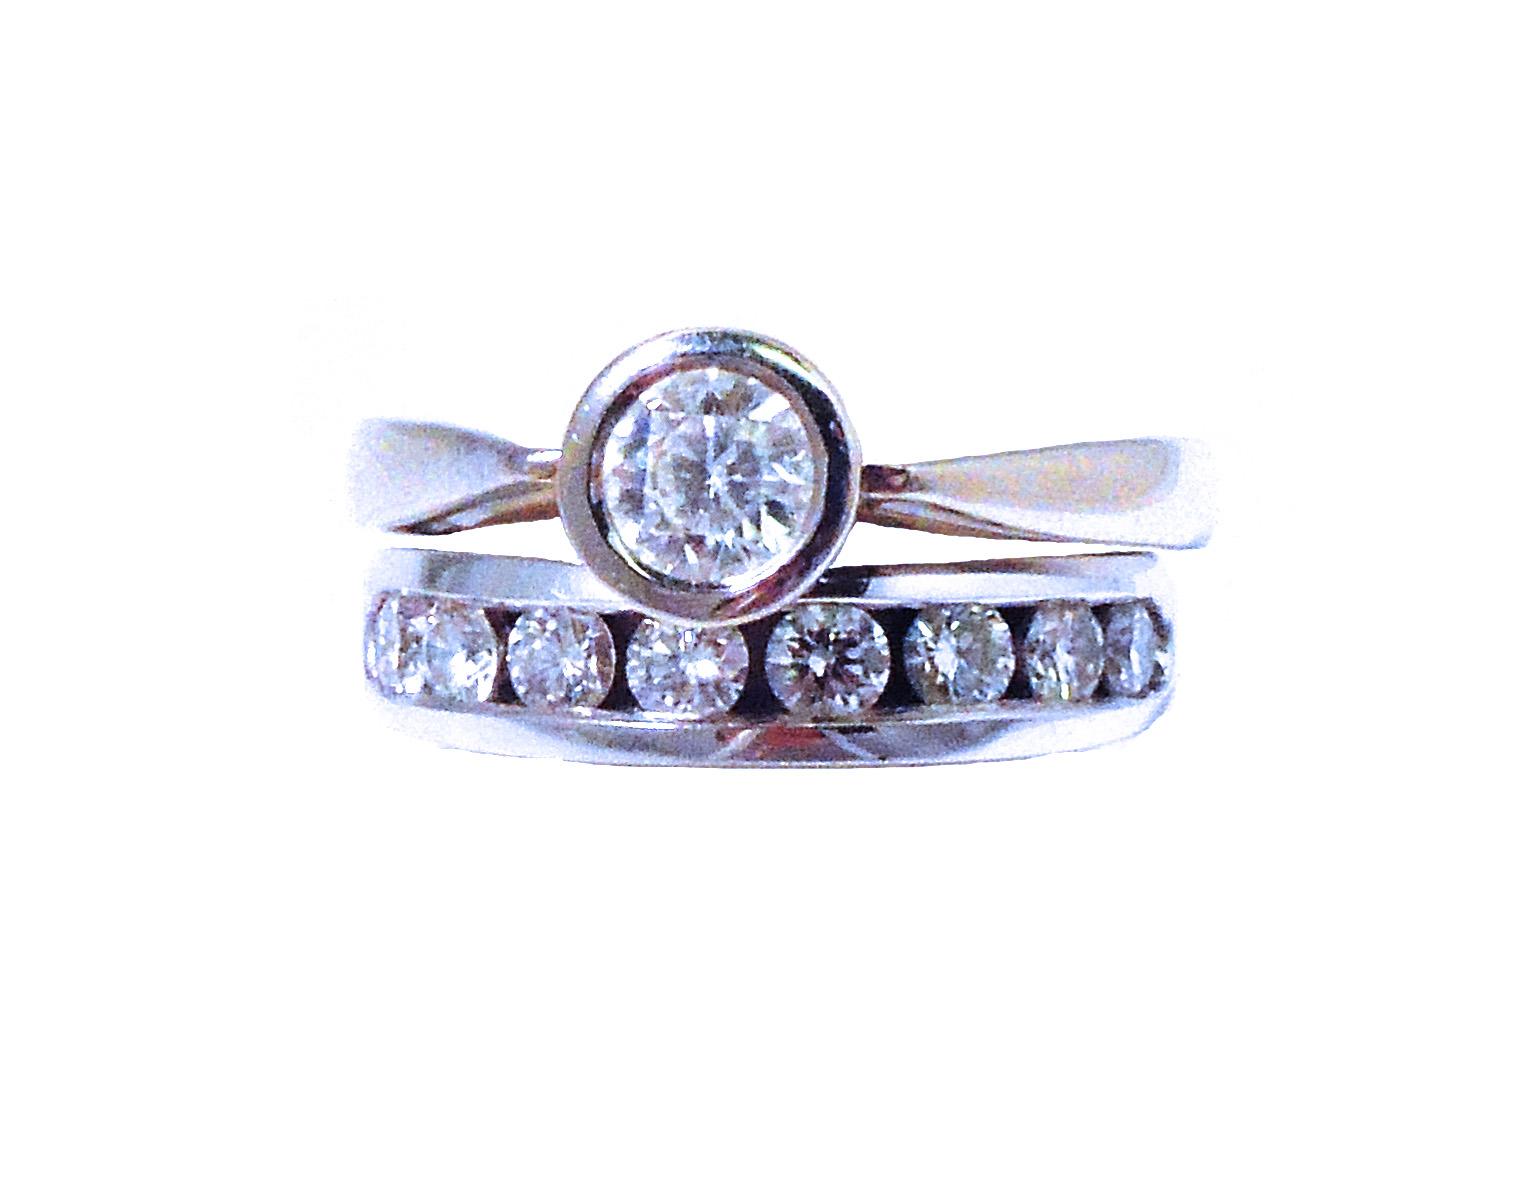 14K 0.41ct Bezel-Set Solitaire Diamond Ring with Channel-Set Diamond Wedding Band